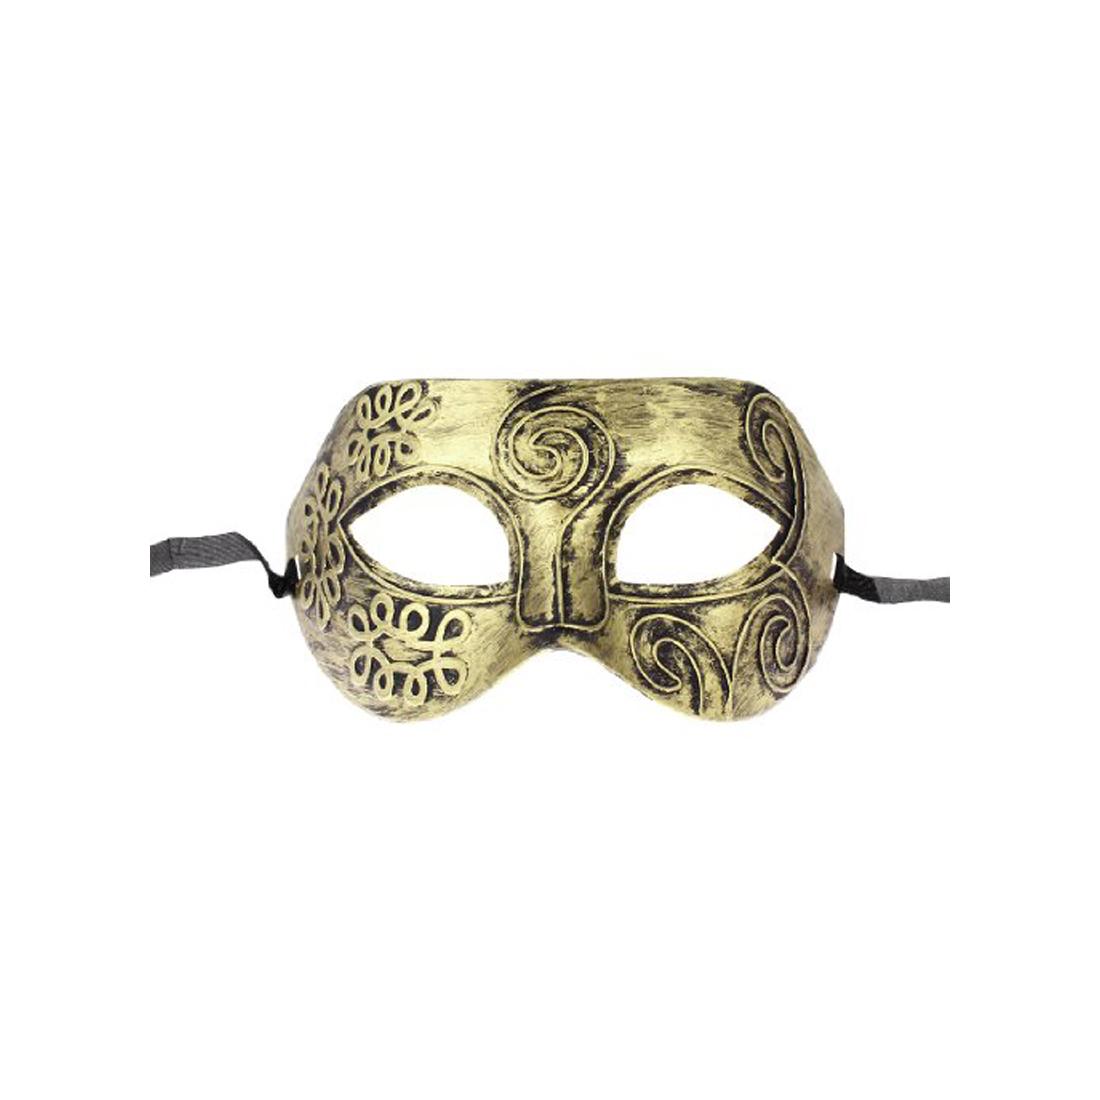 LHLL-New Gold Tone Roman Greek Mens Venetian Halloween Costume Party Masquerade Mask(China (Mainland))